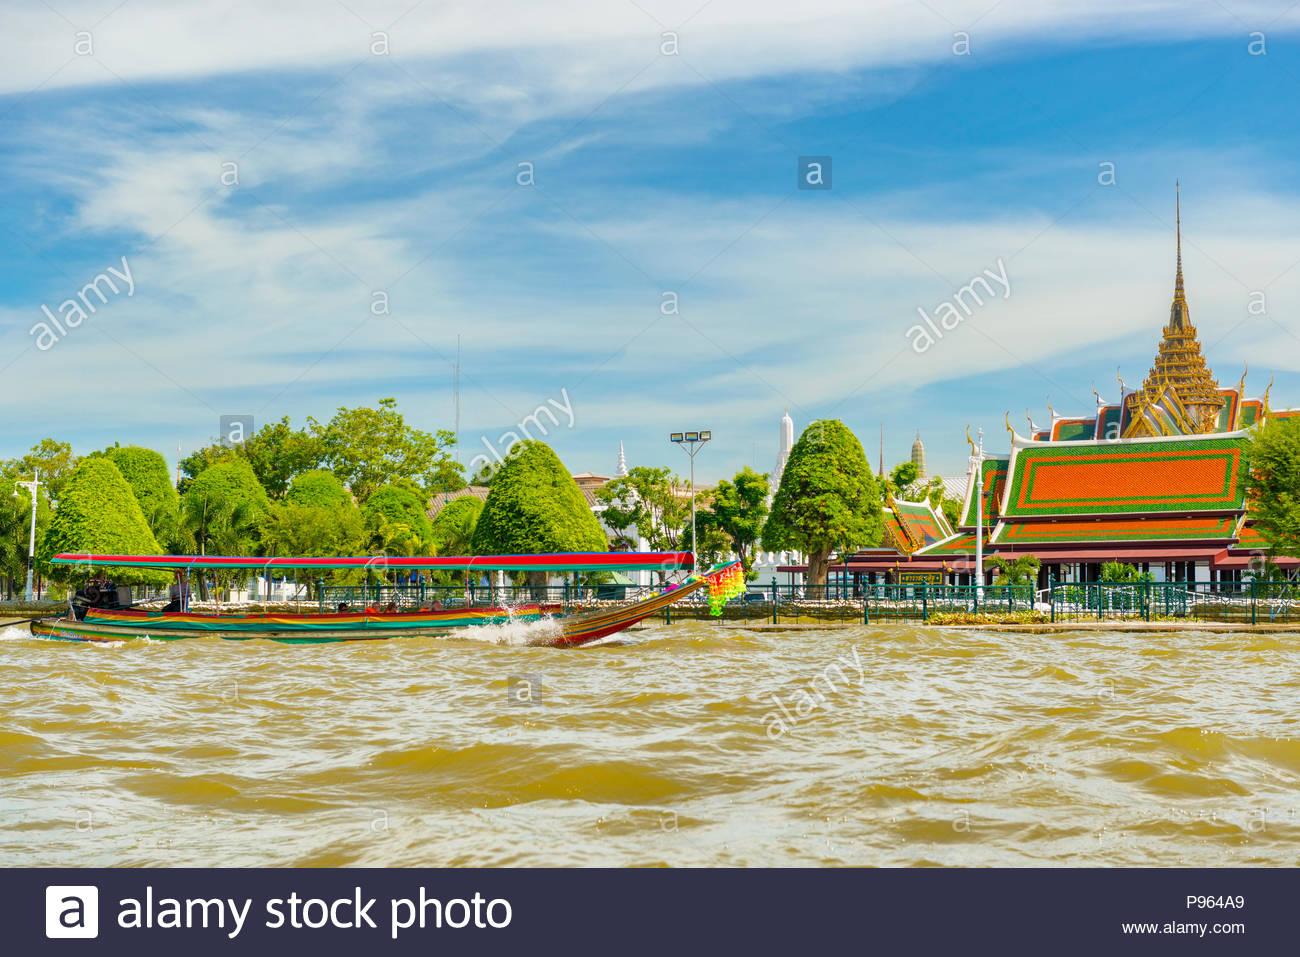 Bangkok Thailand   Nov 24 2017 Boats with tourists floating on 1300x957